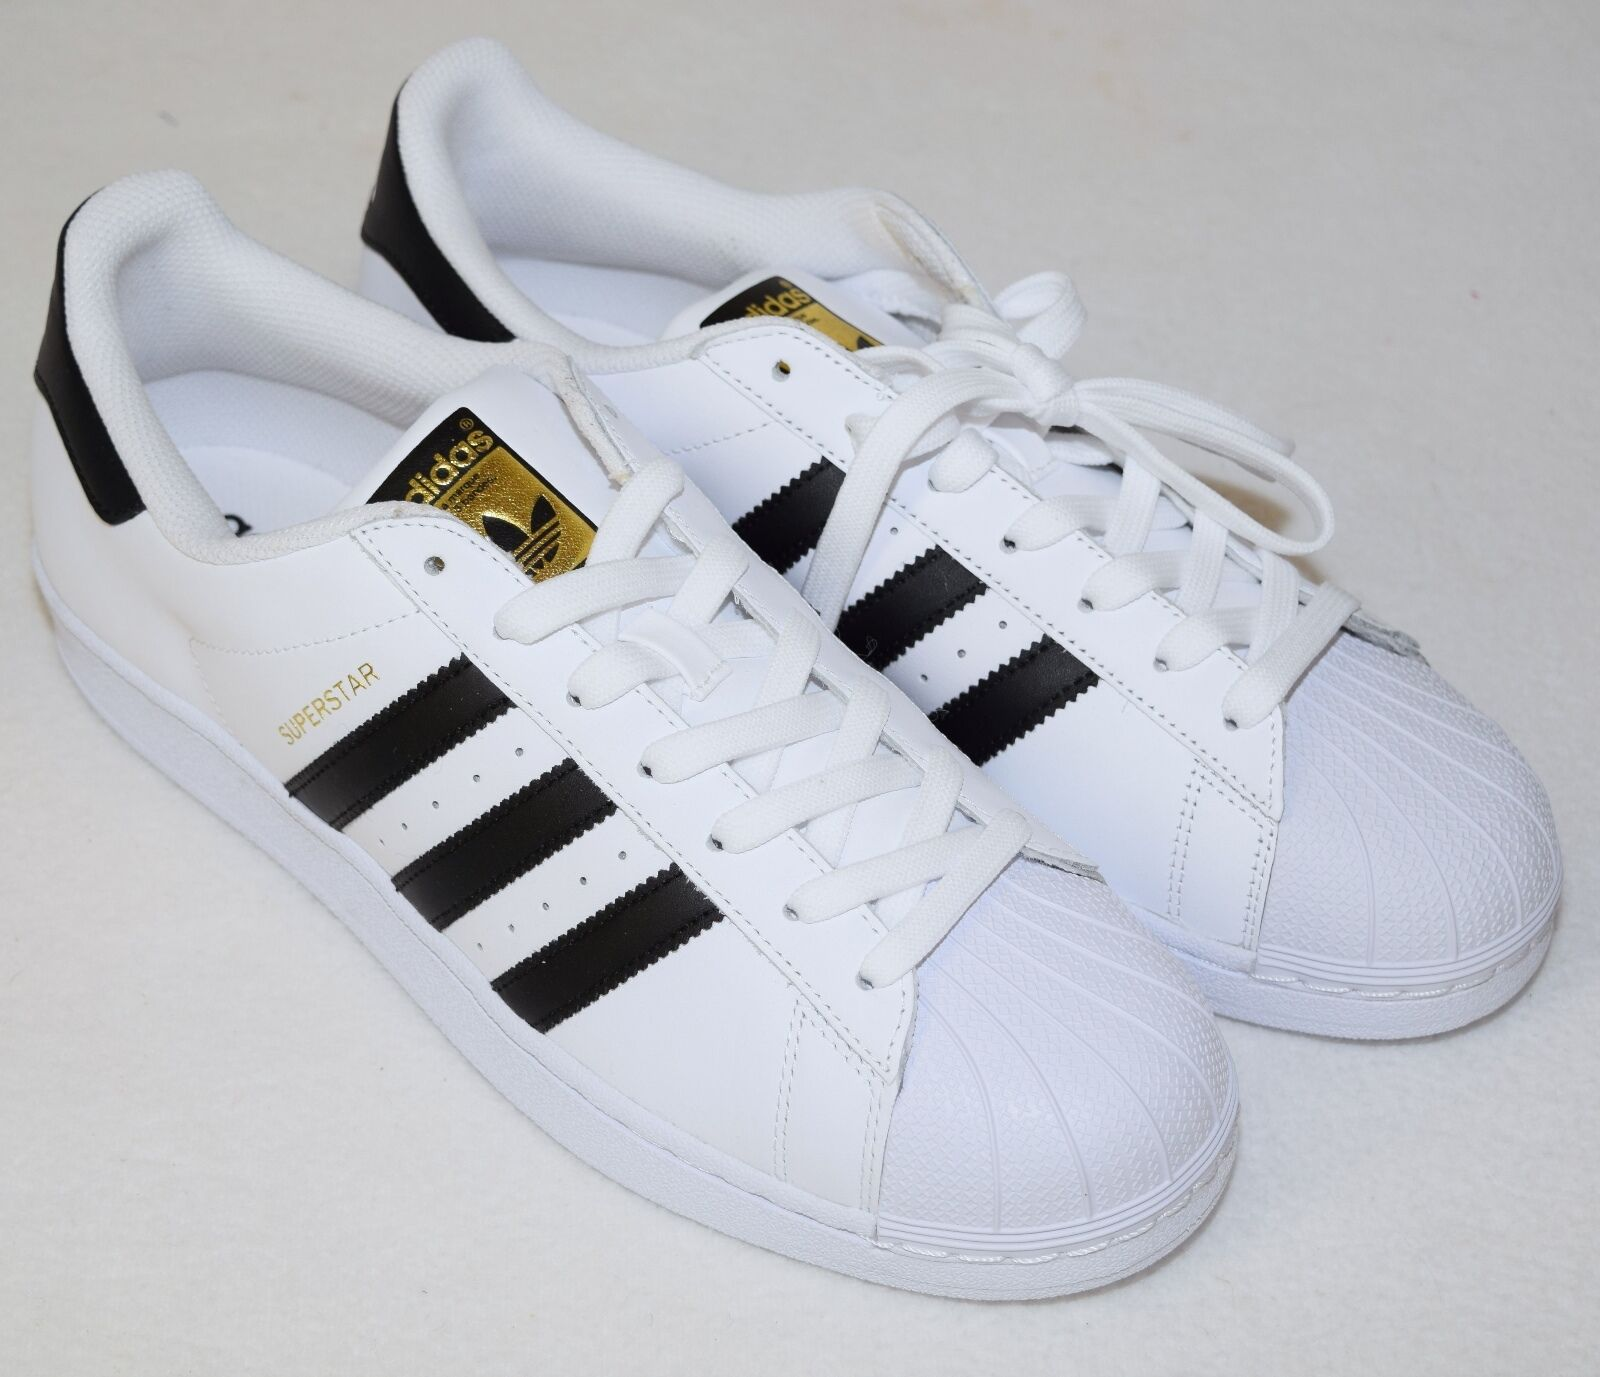 Adidas Superstar White Black gold shoes Sneakers Men's C77124 10.5 NEW La Marque